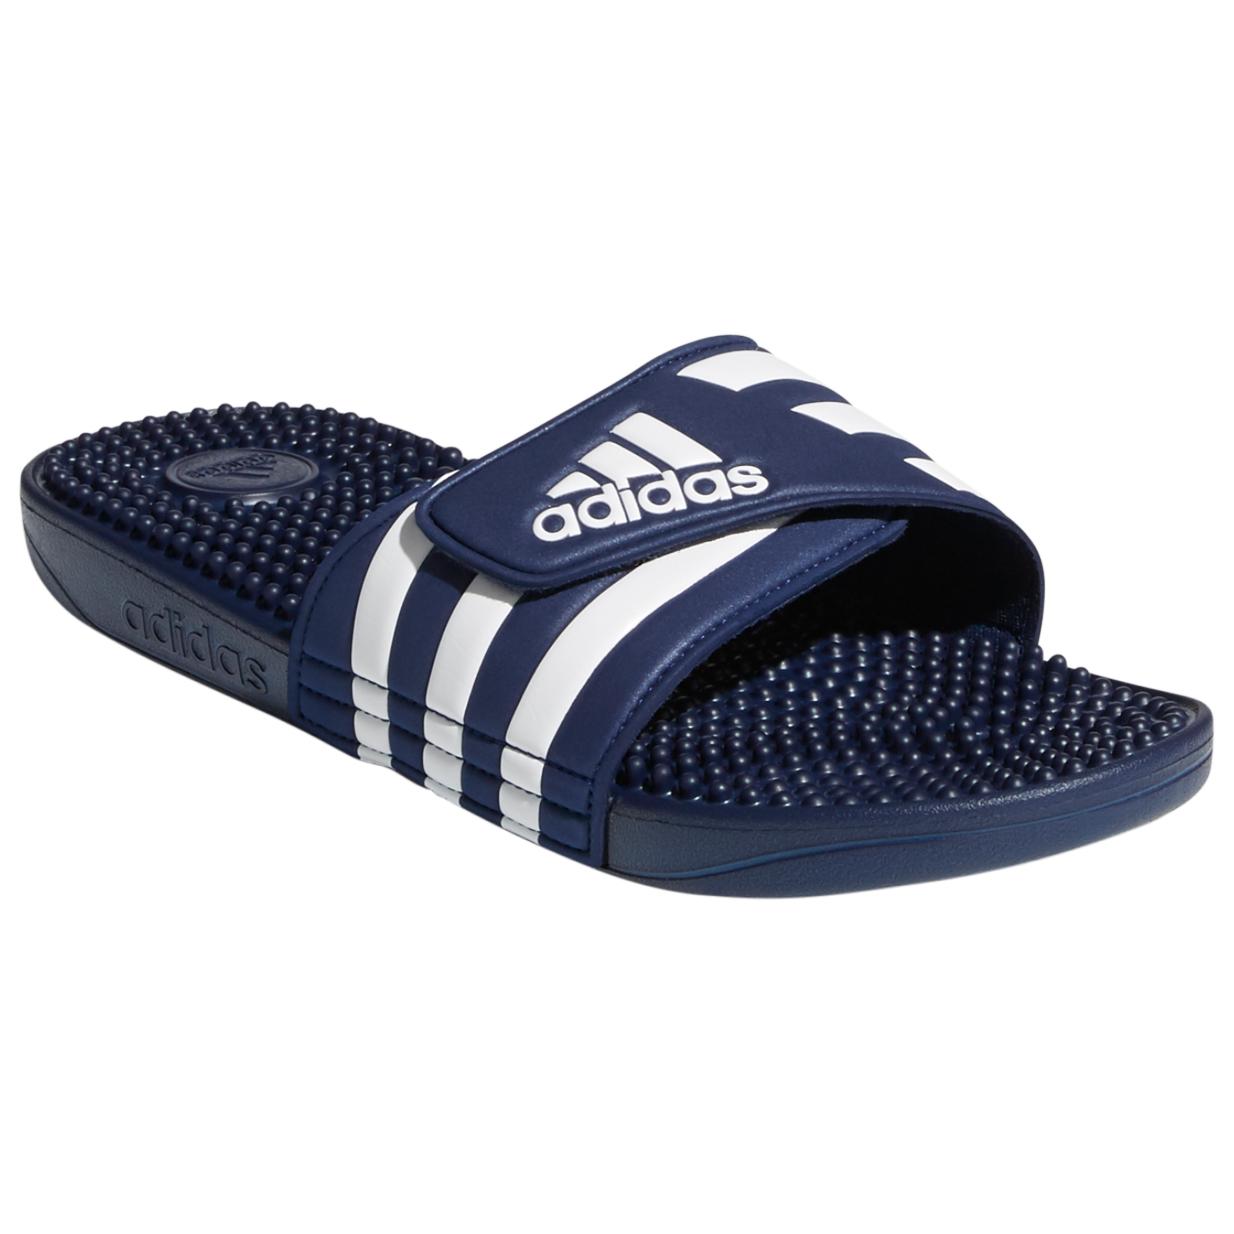 01669b9f2141 Adidas Adissage - Sandals Men s